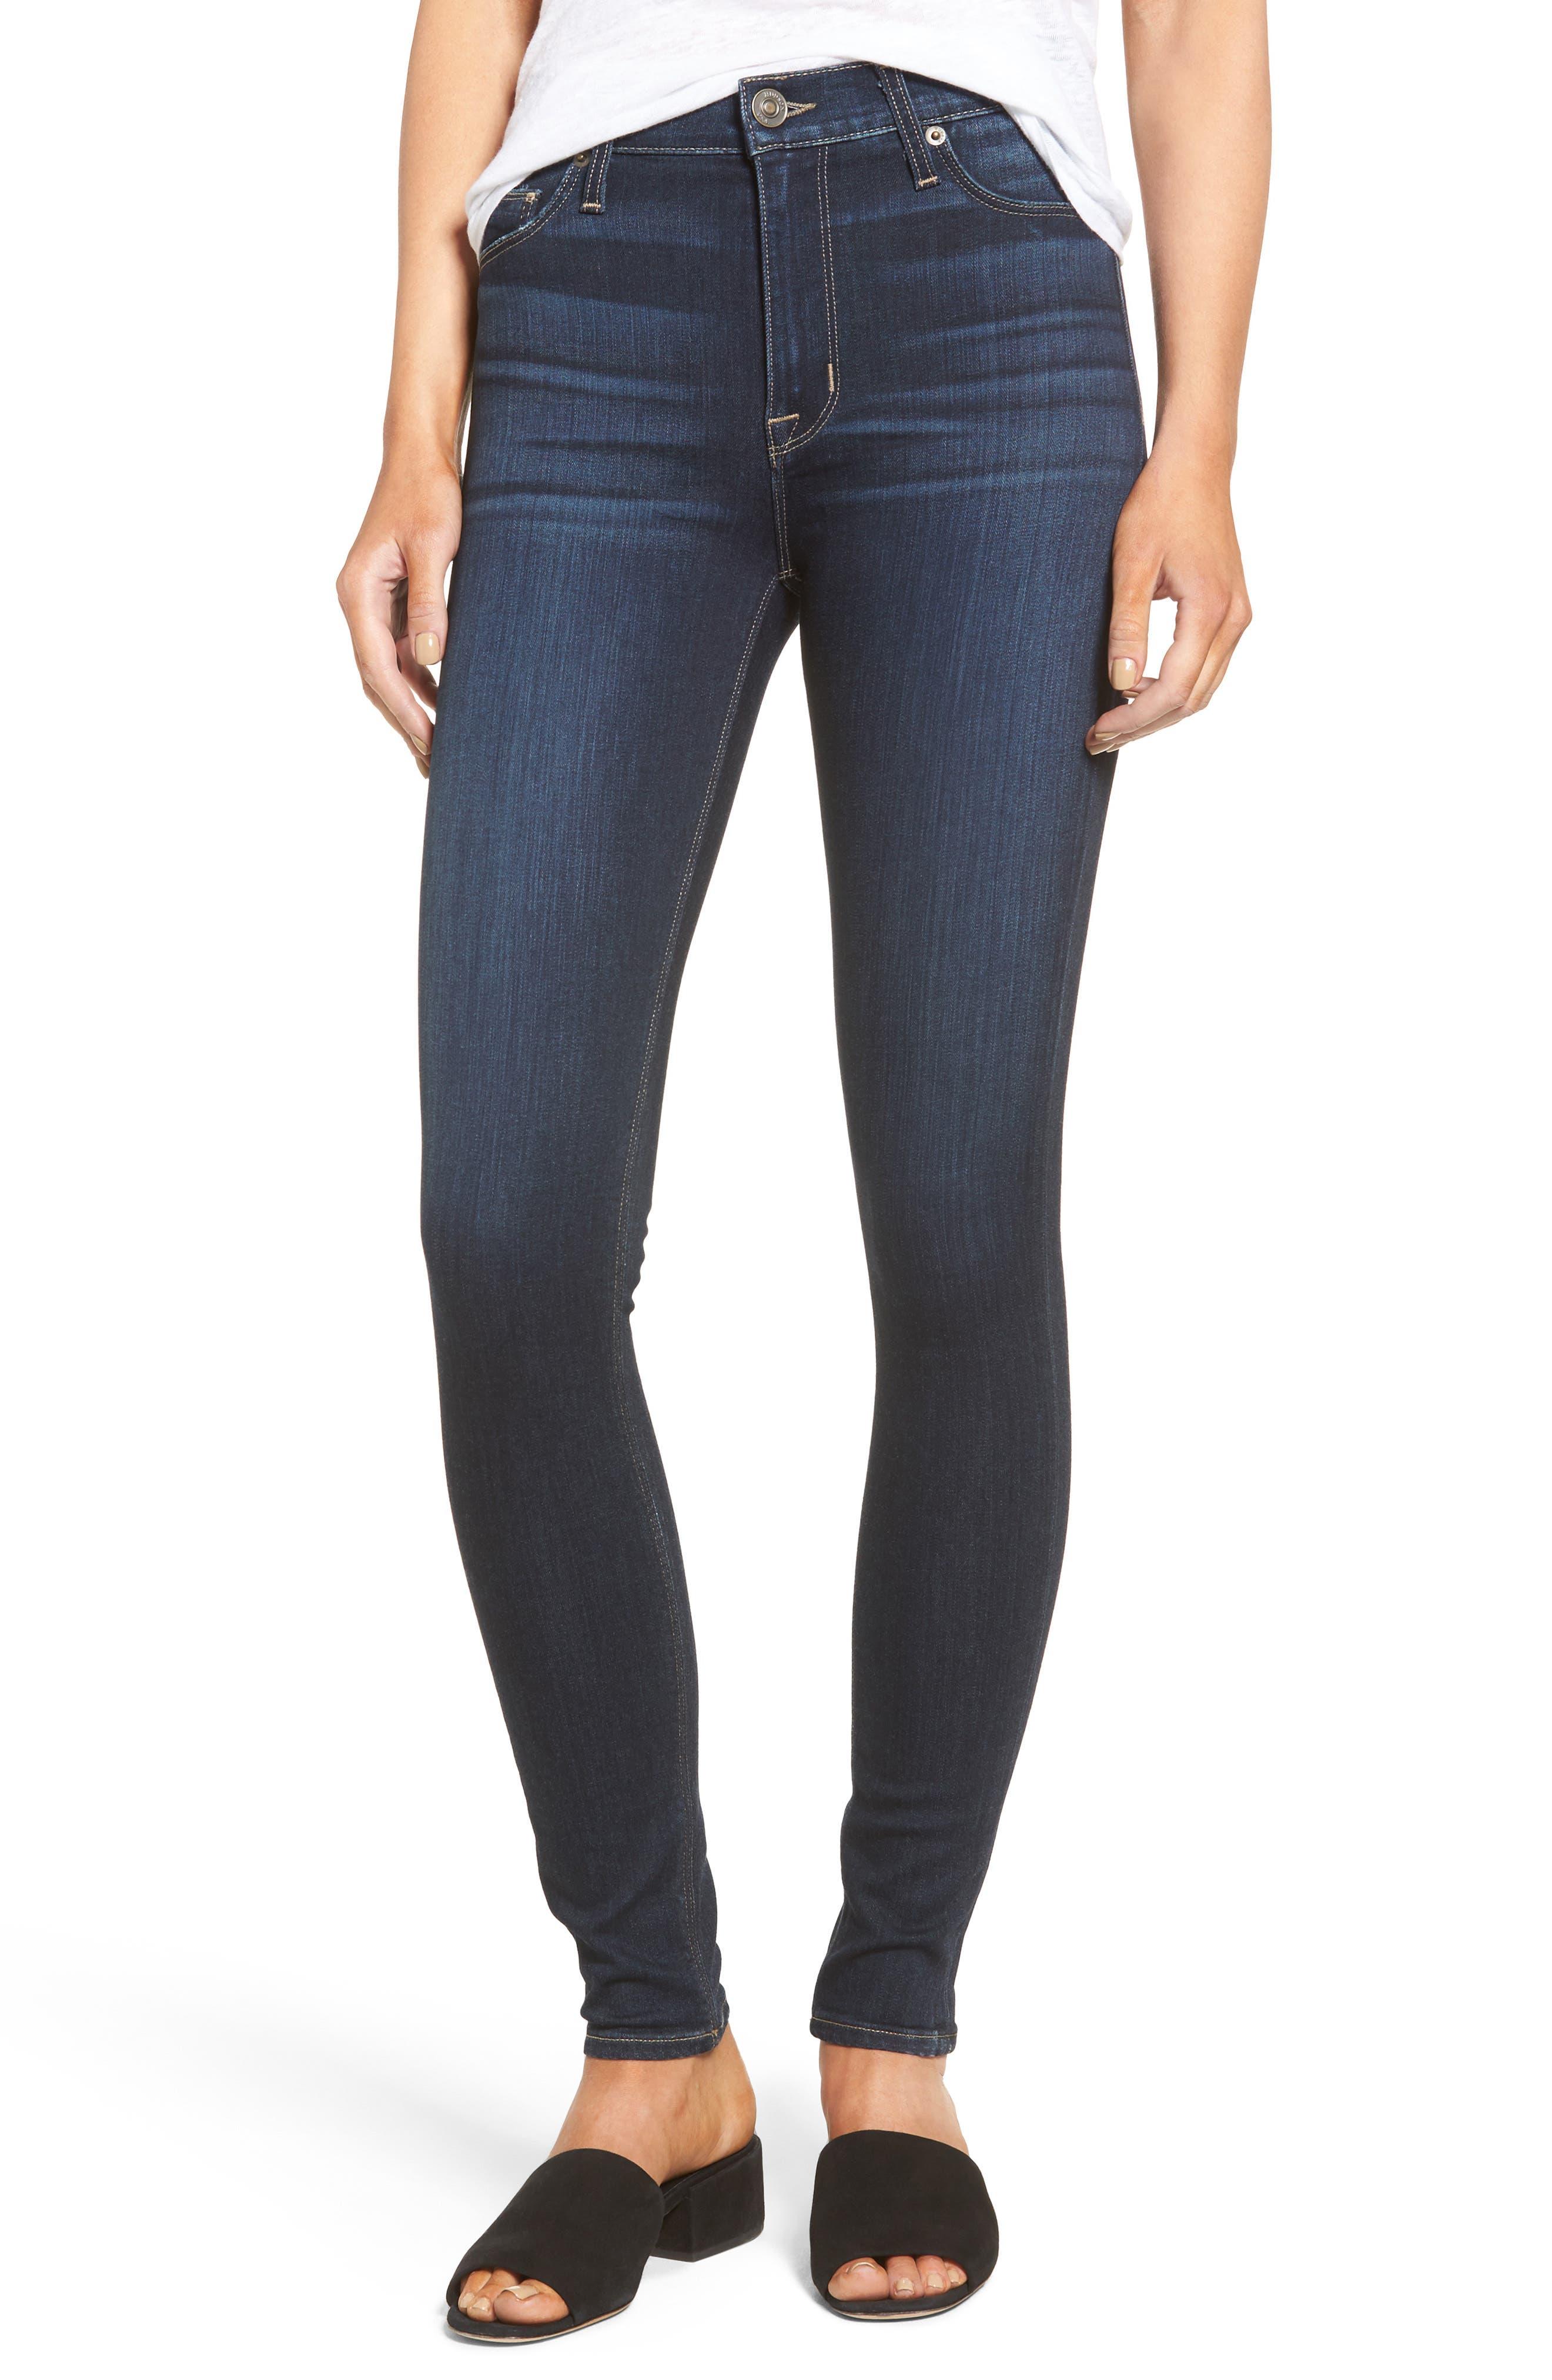 Barbara High Waist Super Skinny Jeans,                         Main,                         color, Recruit 2